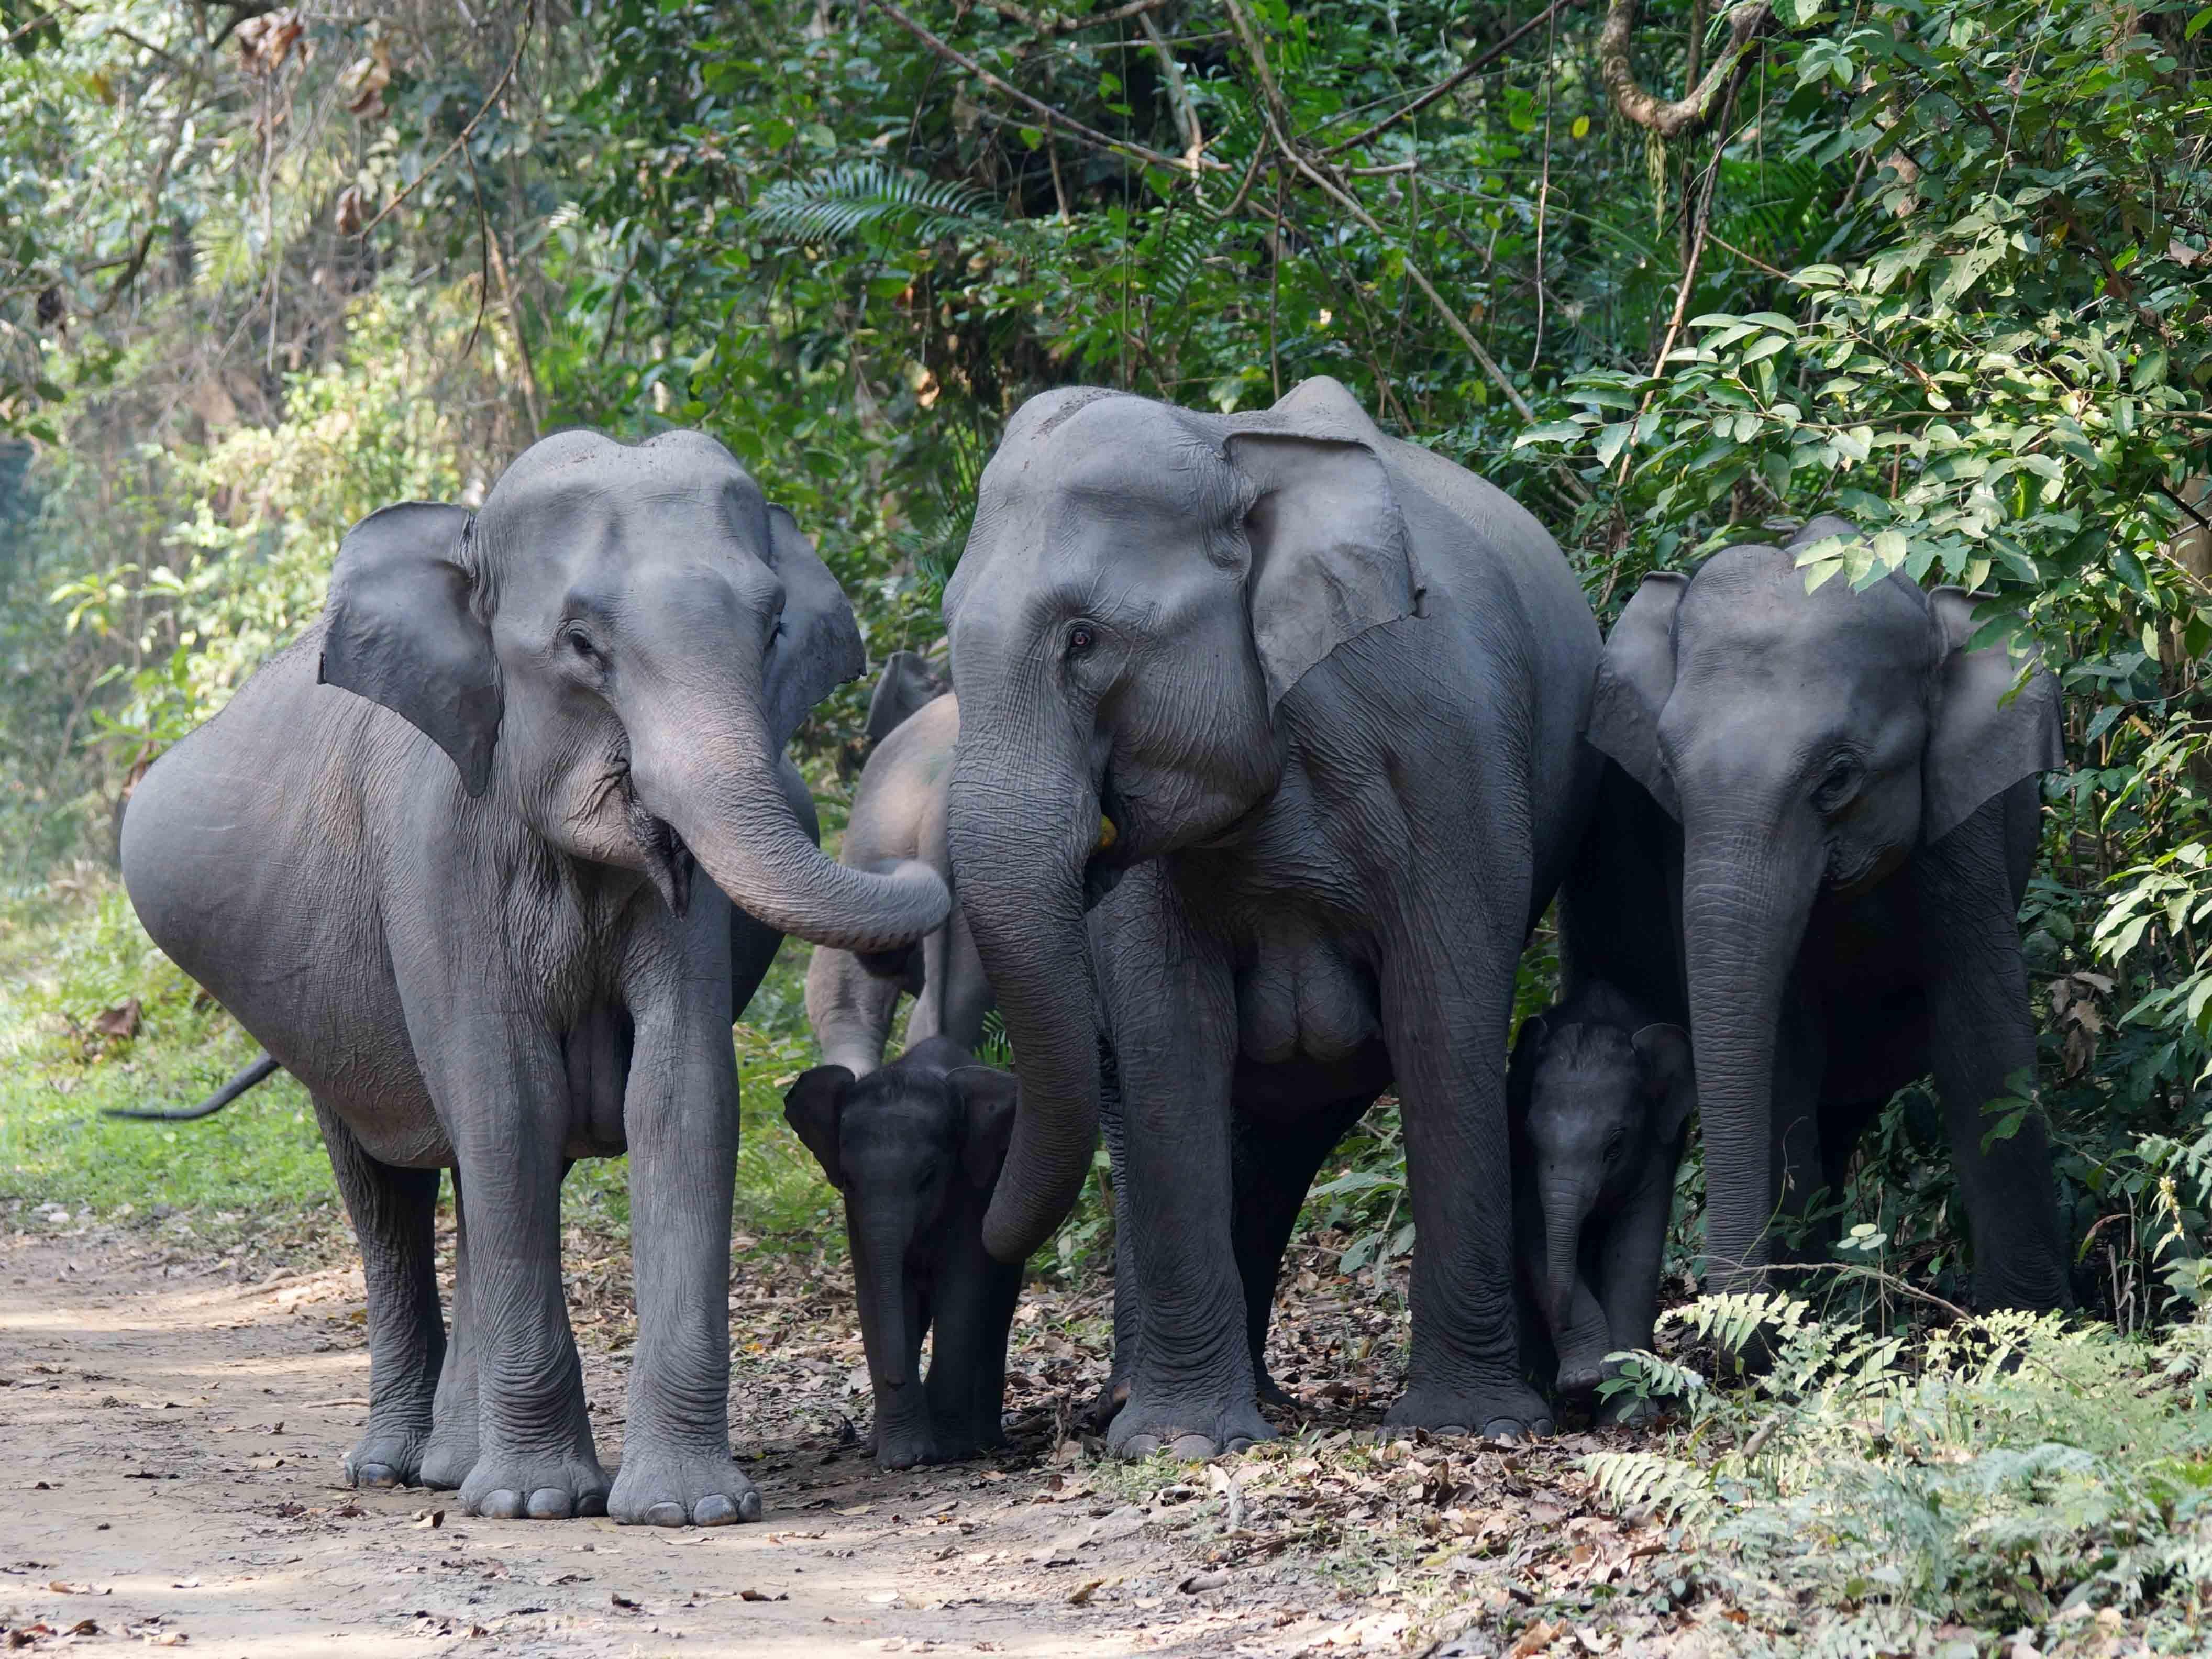 Olifant, Aziatische olifant, Kaziranga, India